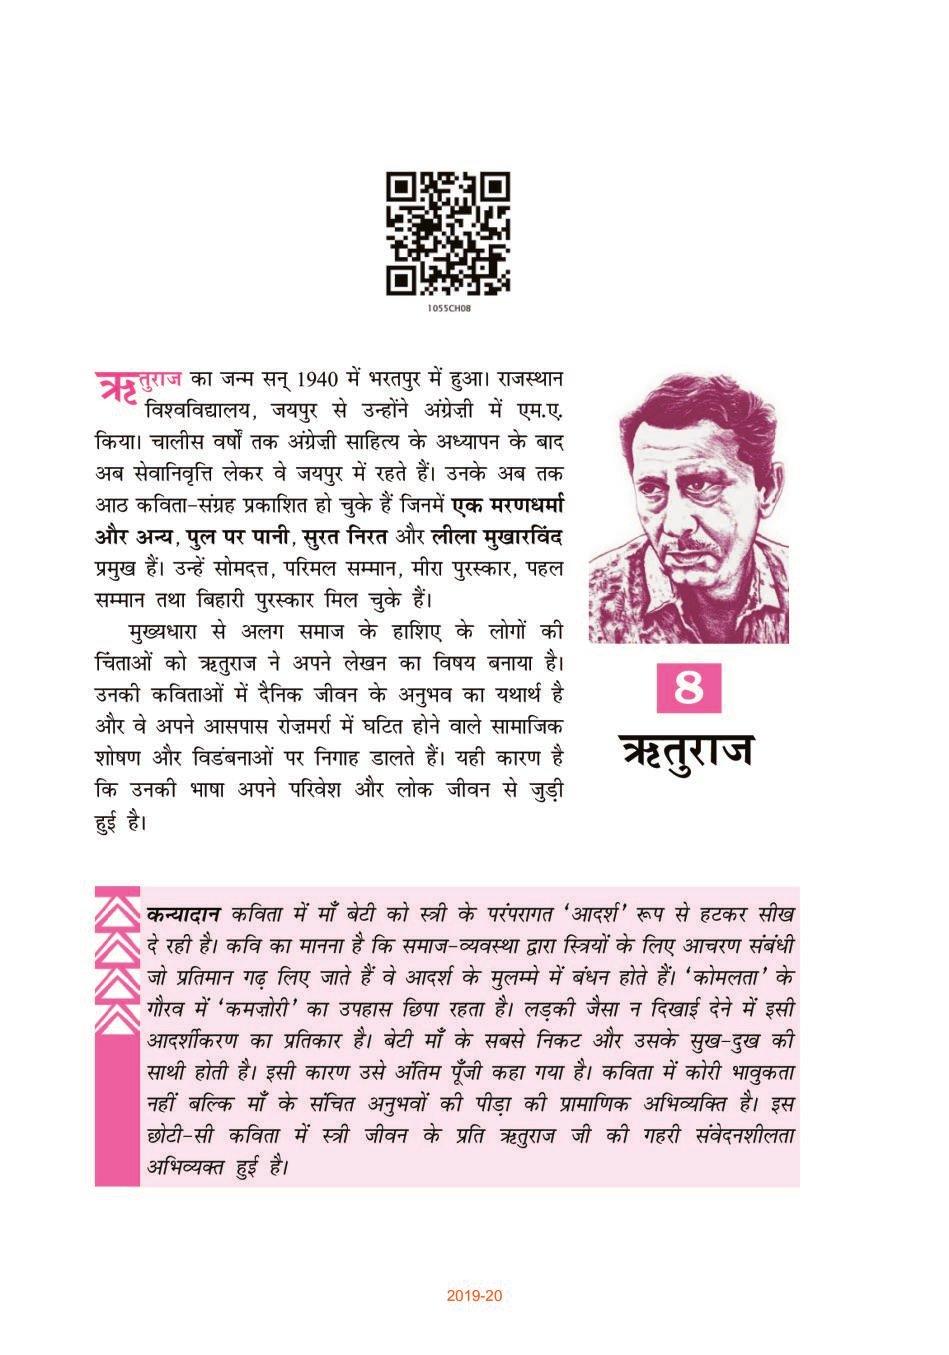 NCERT Book Class 10 Hindi (क्षितिज) Chapter 8 ऋतुराज - Page 1